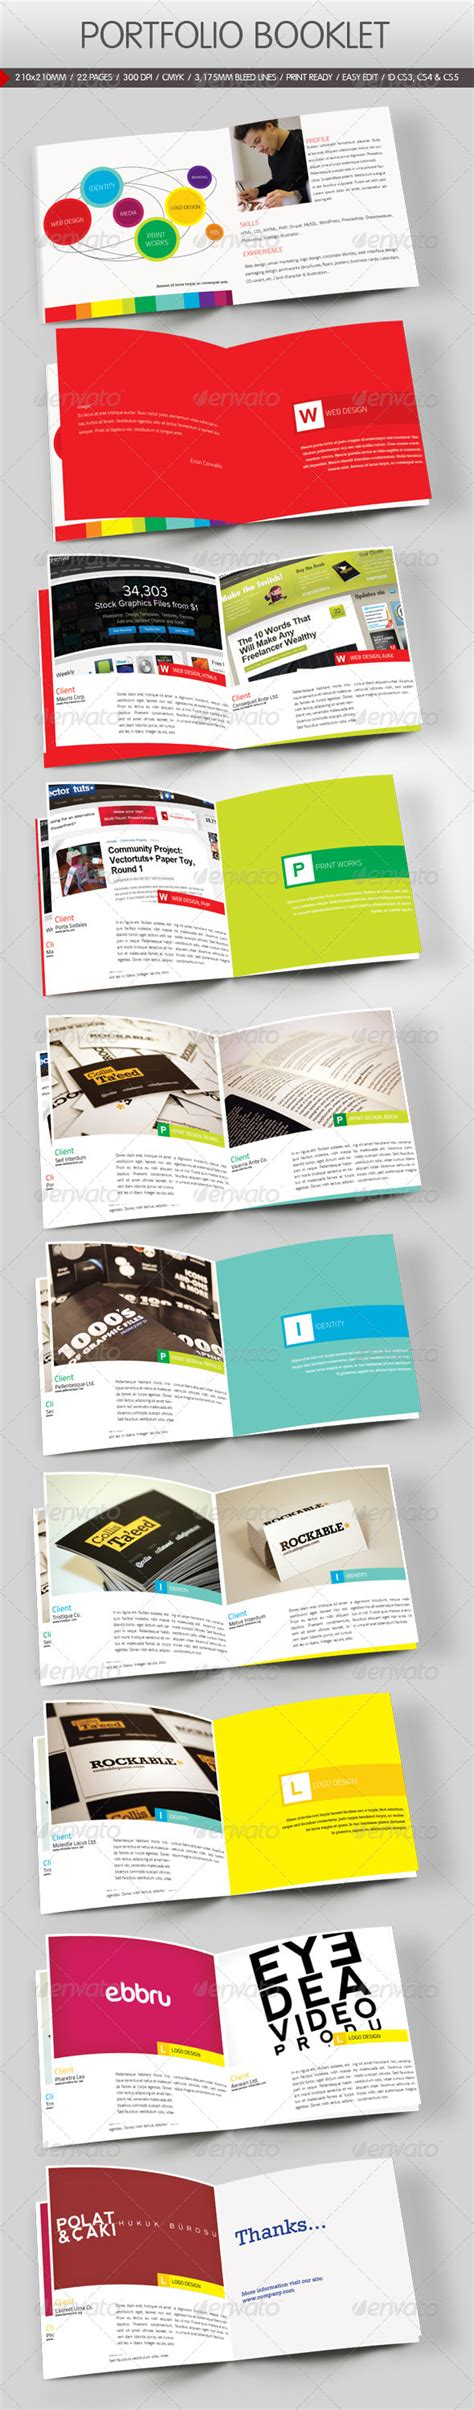 Print Portfolio Template portfolio booklet graphicriver